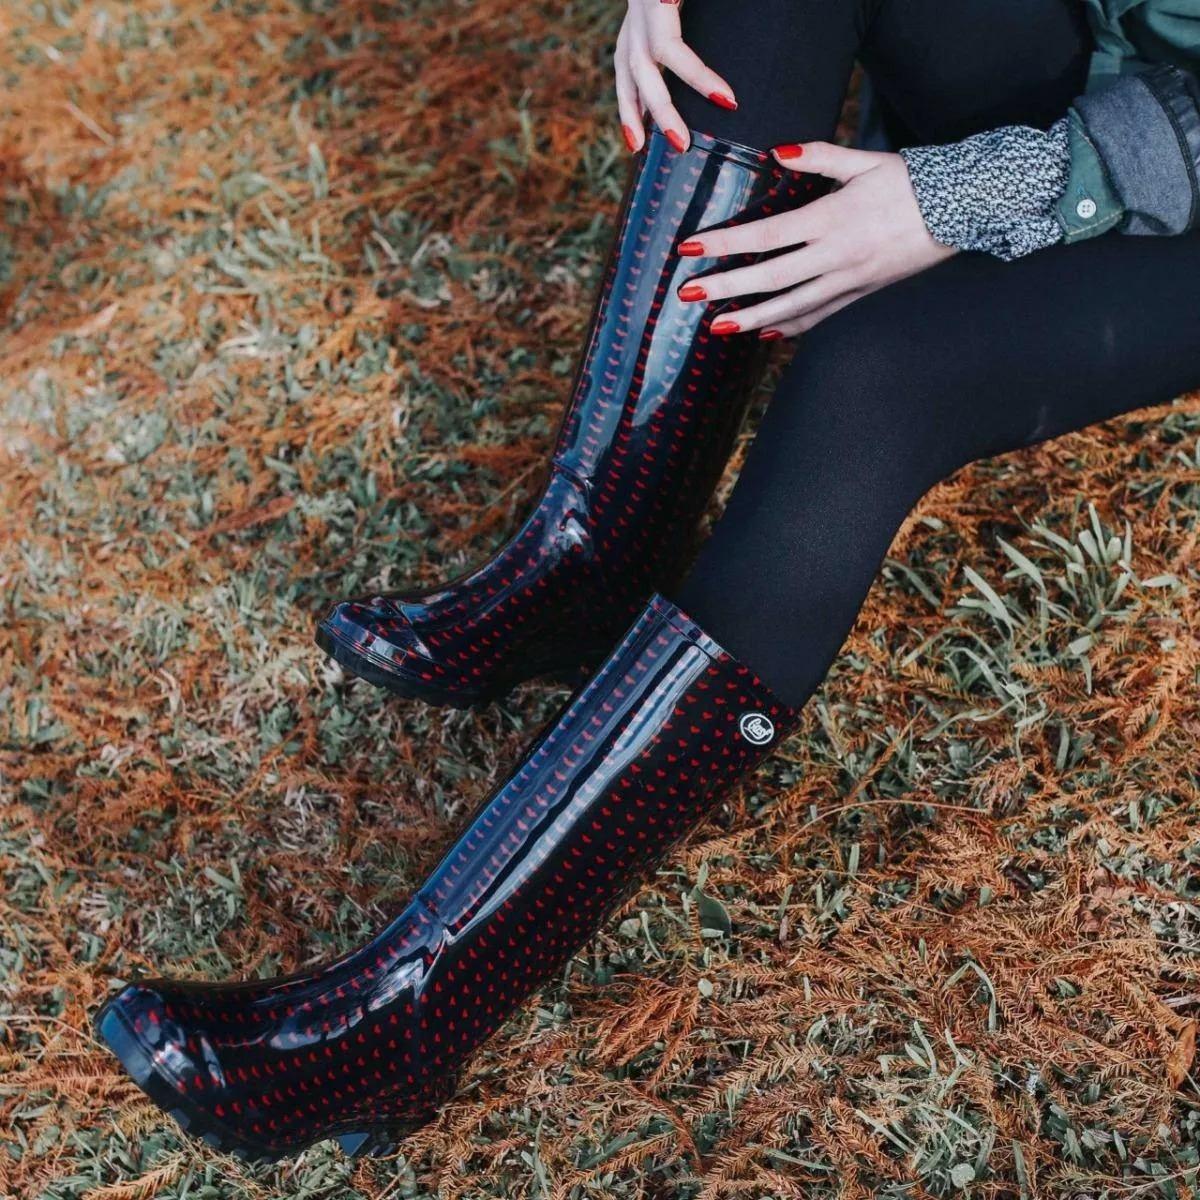 bd32ddbaf94 bota galocha de borracha feminina adulto bota chuva coração. Carregando  zoom.